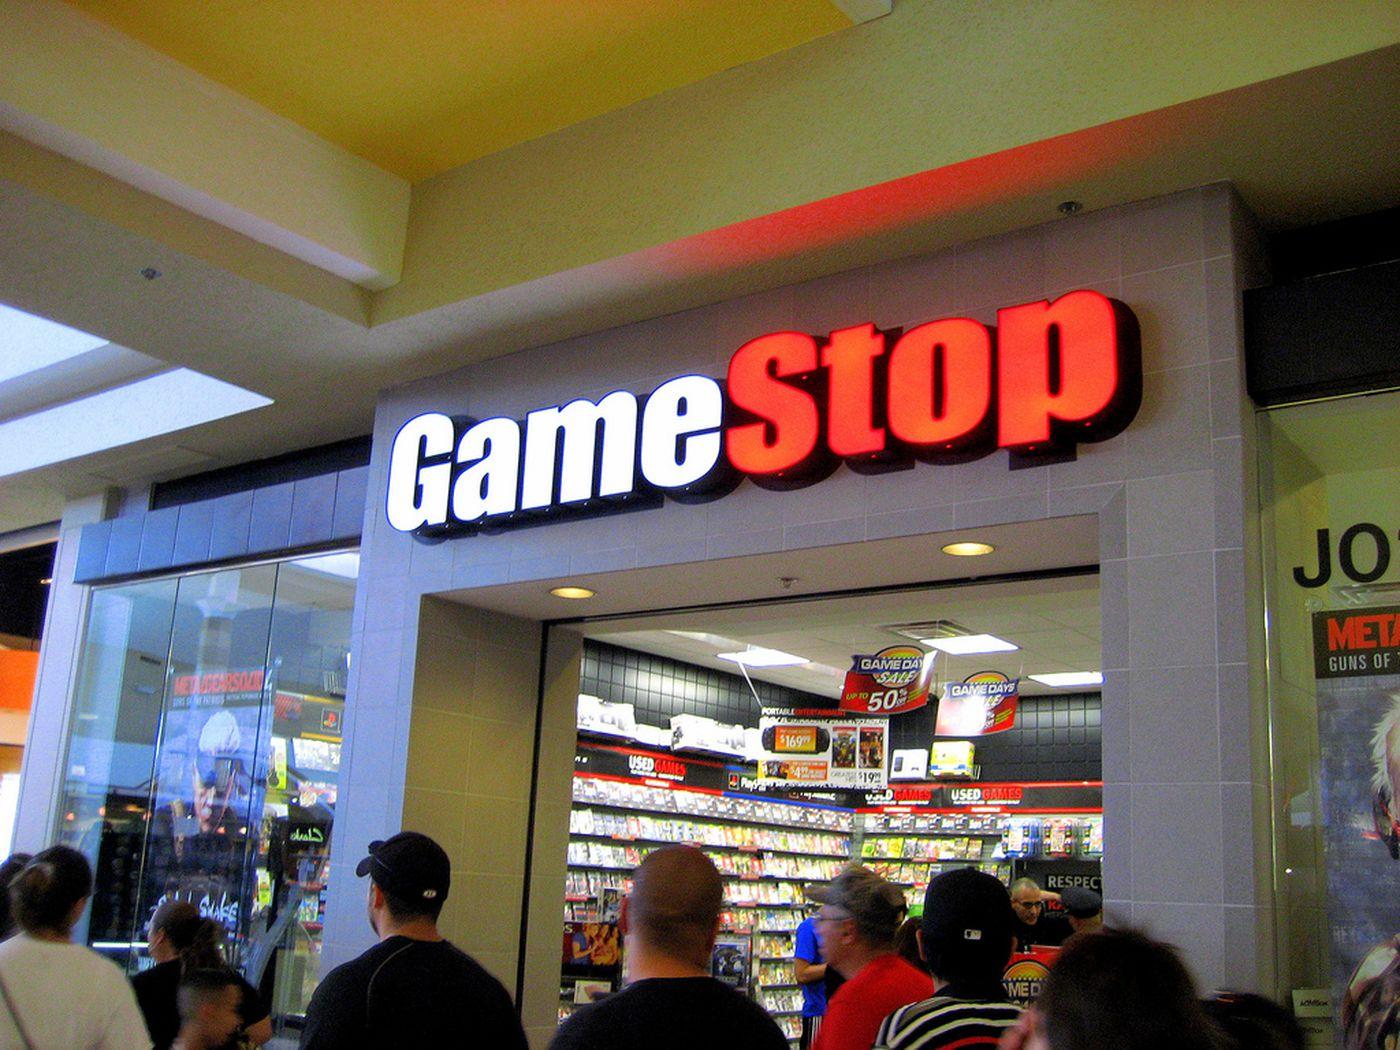 GameStop tax season sale kicks off with a members-only Pro